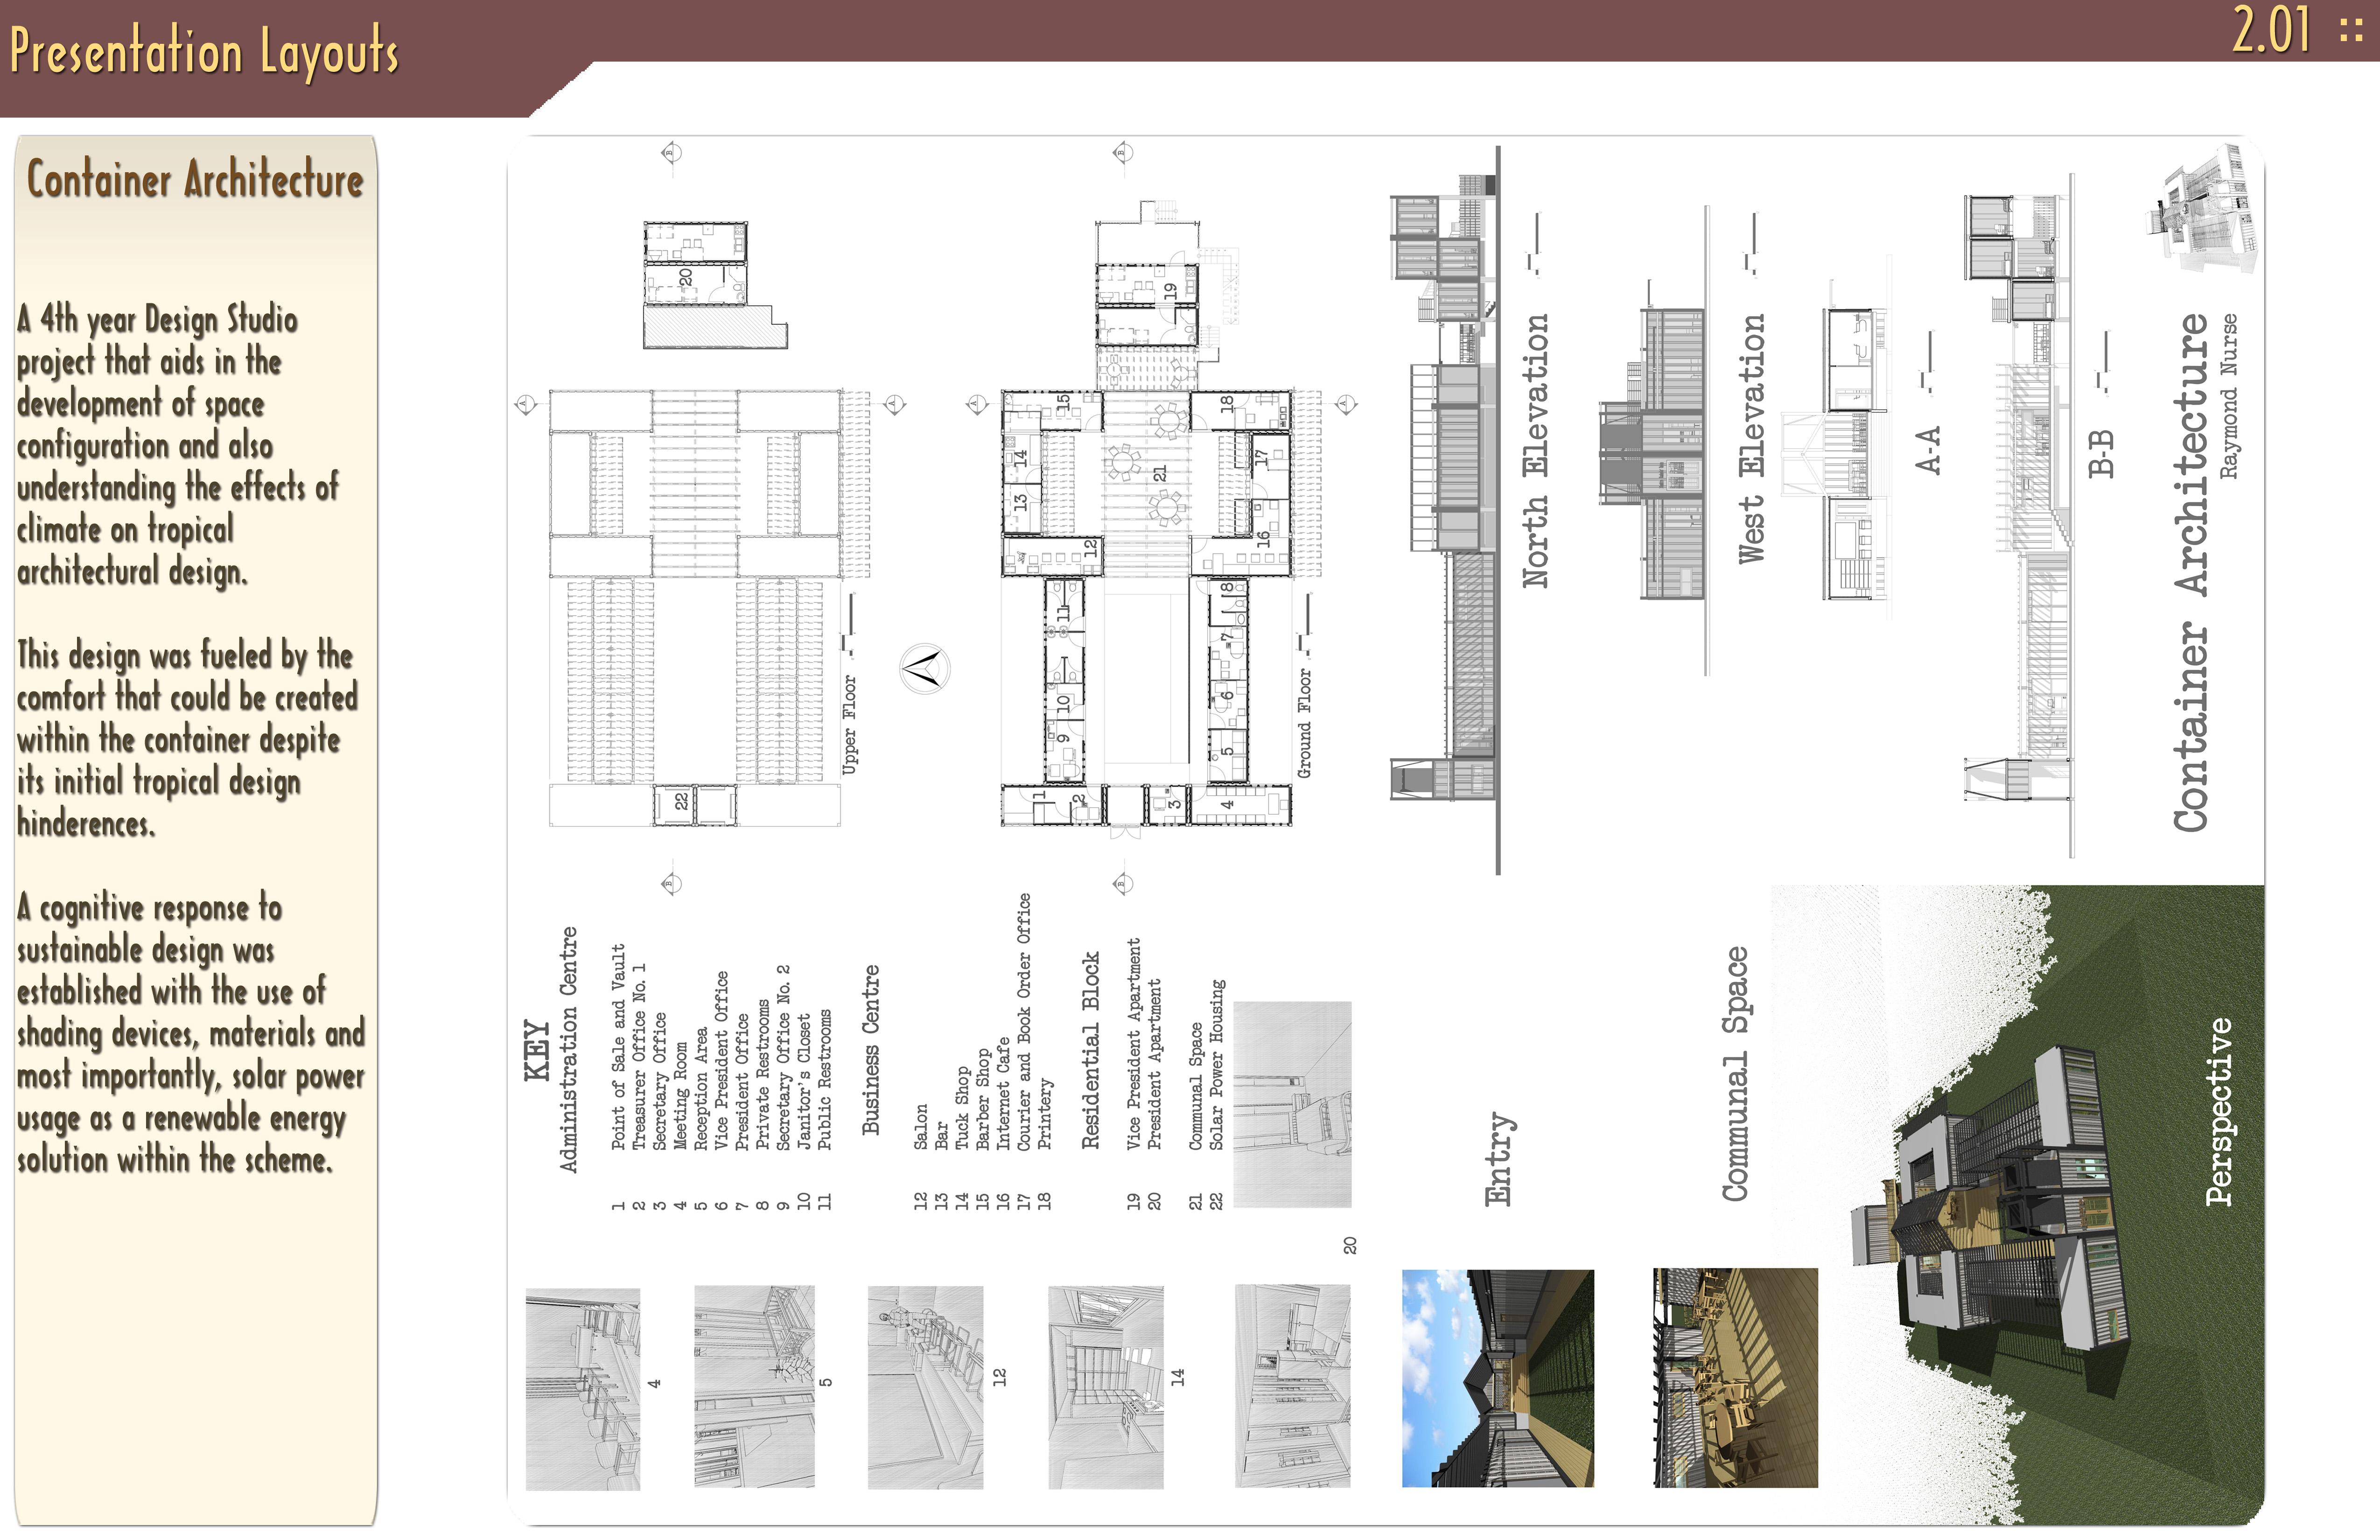 Architecture Design Layout architectural layouts - interior design